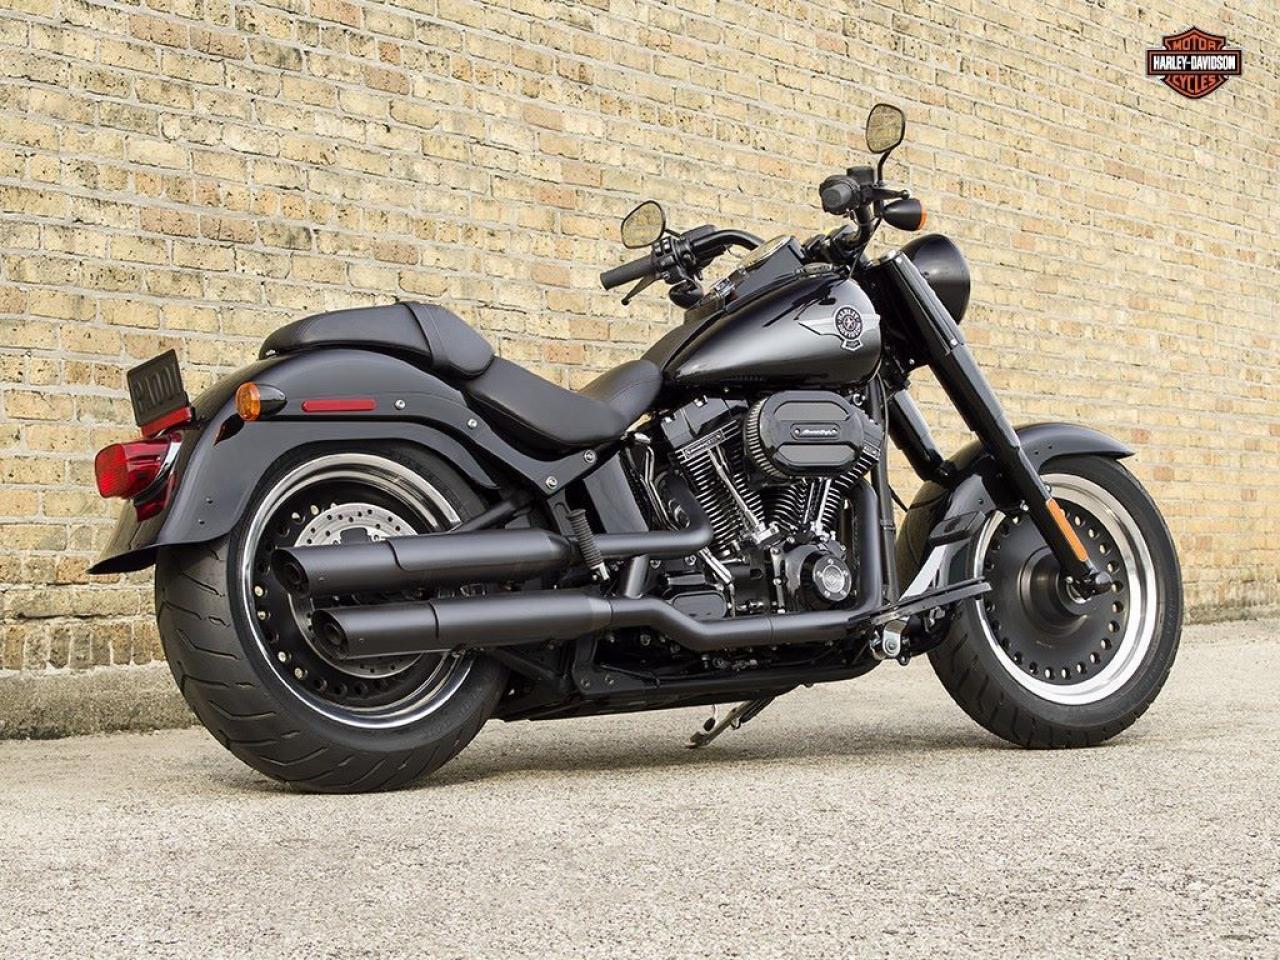 2017 Harley-Davidson FAT BOY FLSTFBS FAT BOY LO S